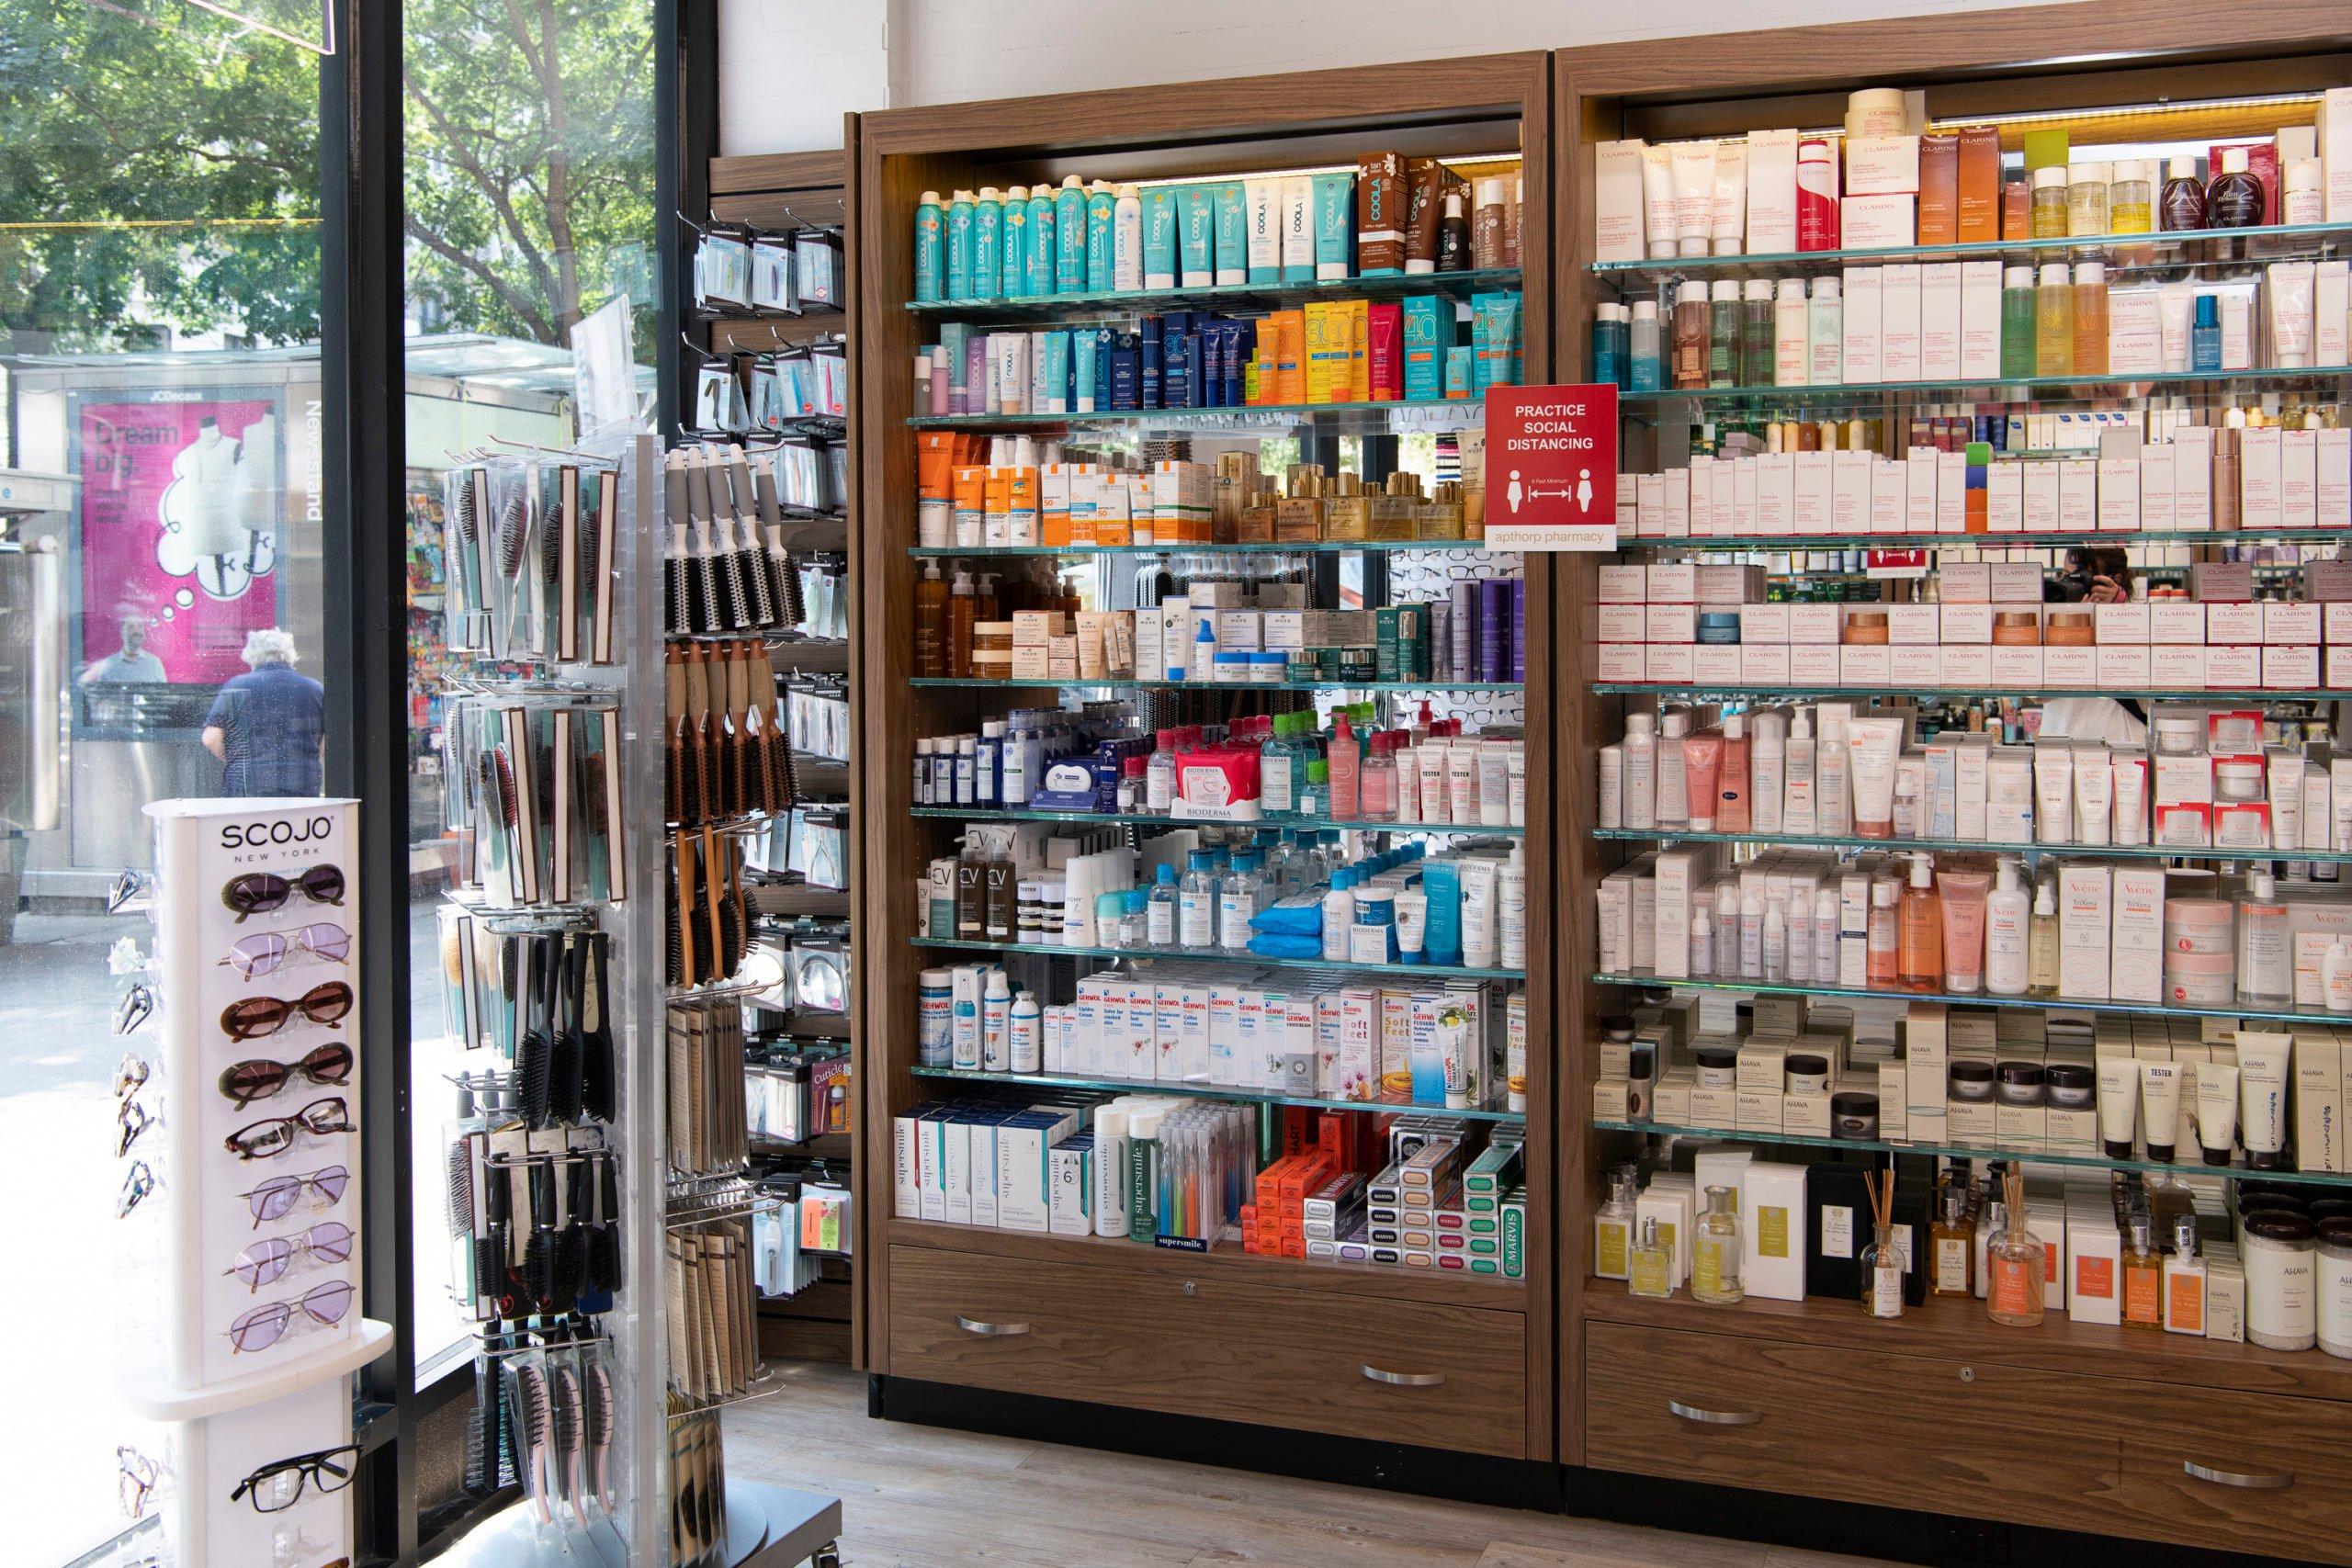 Apthorp-Pharmacy Beauty